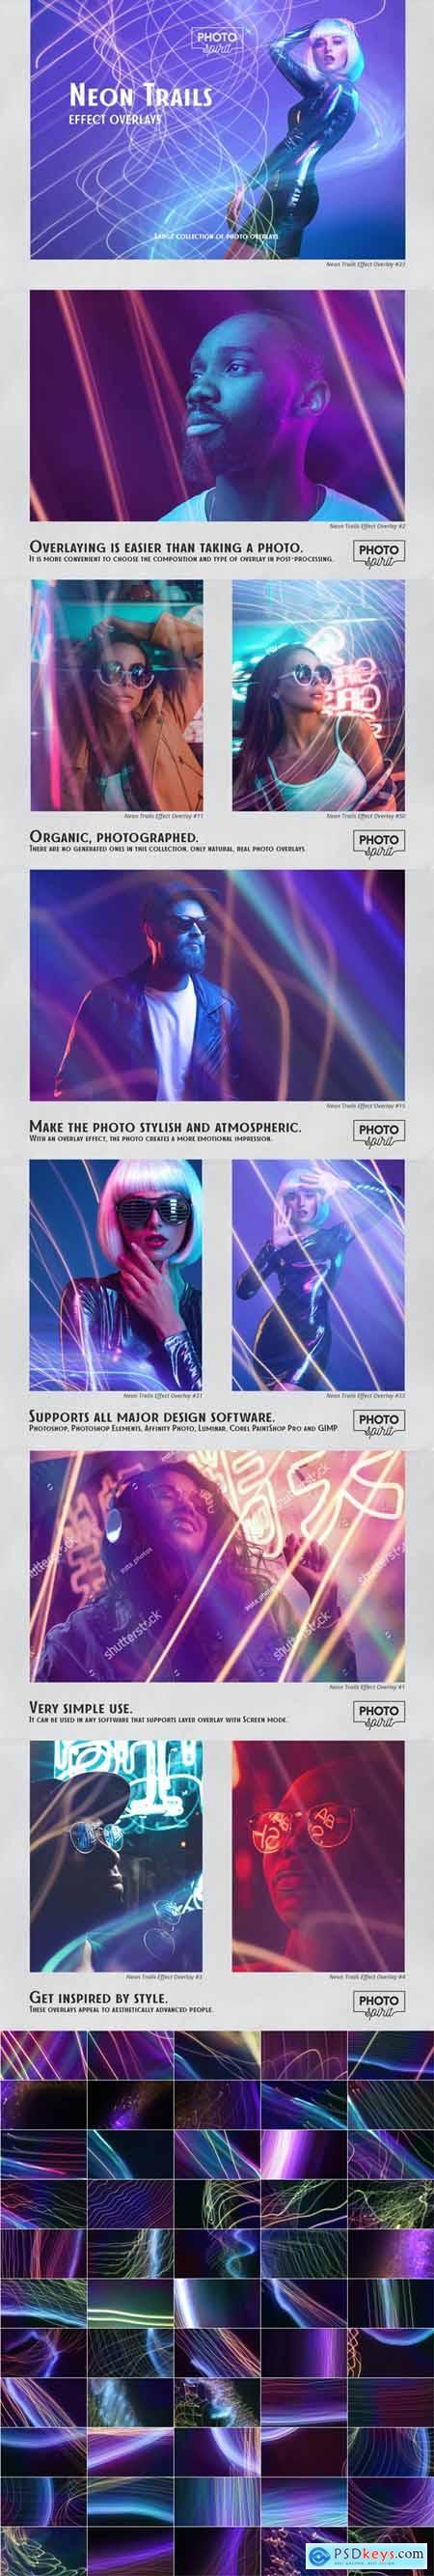 Neon Trails Overlays Effect 33110455